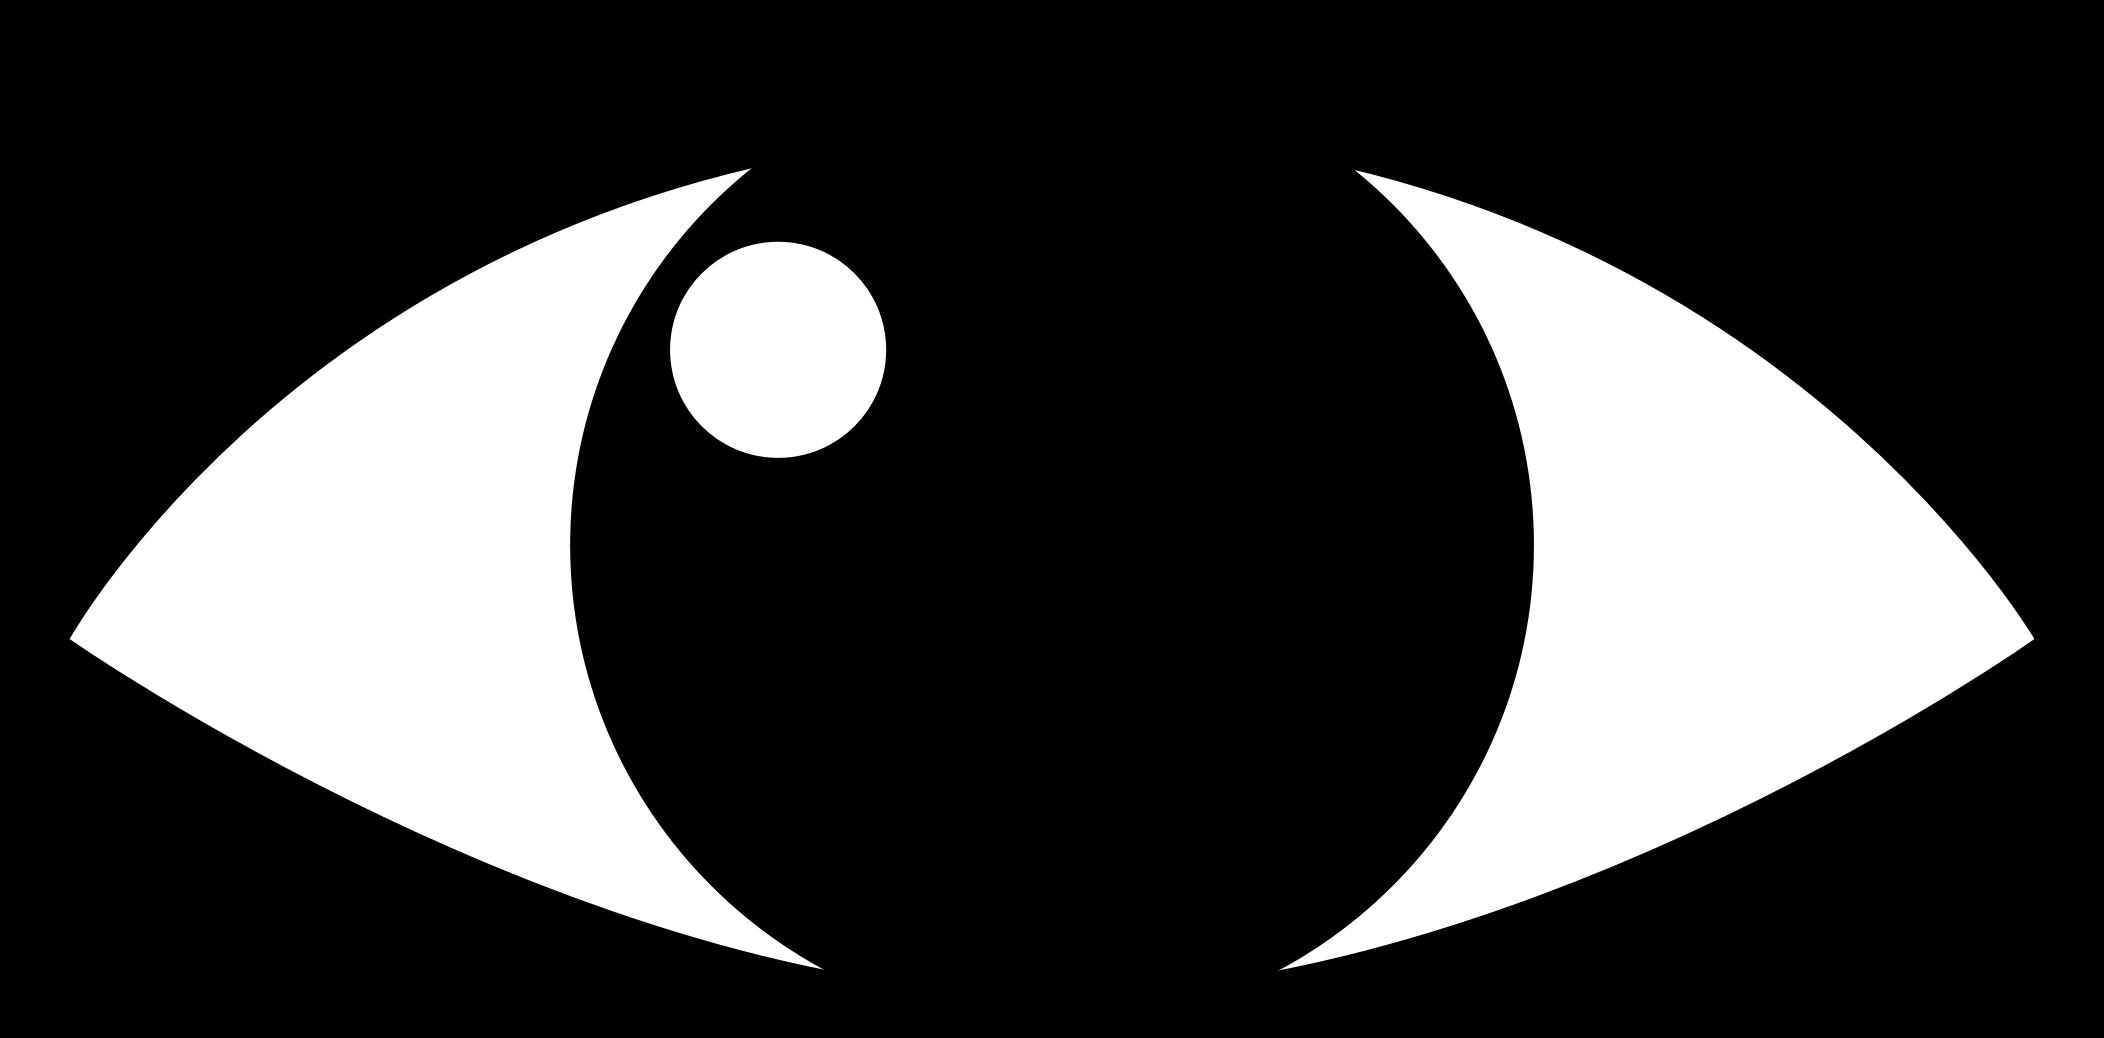 2104x1038 Eyes Eye Clip Art Images Free Clipart